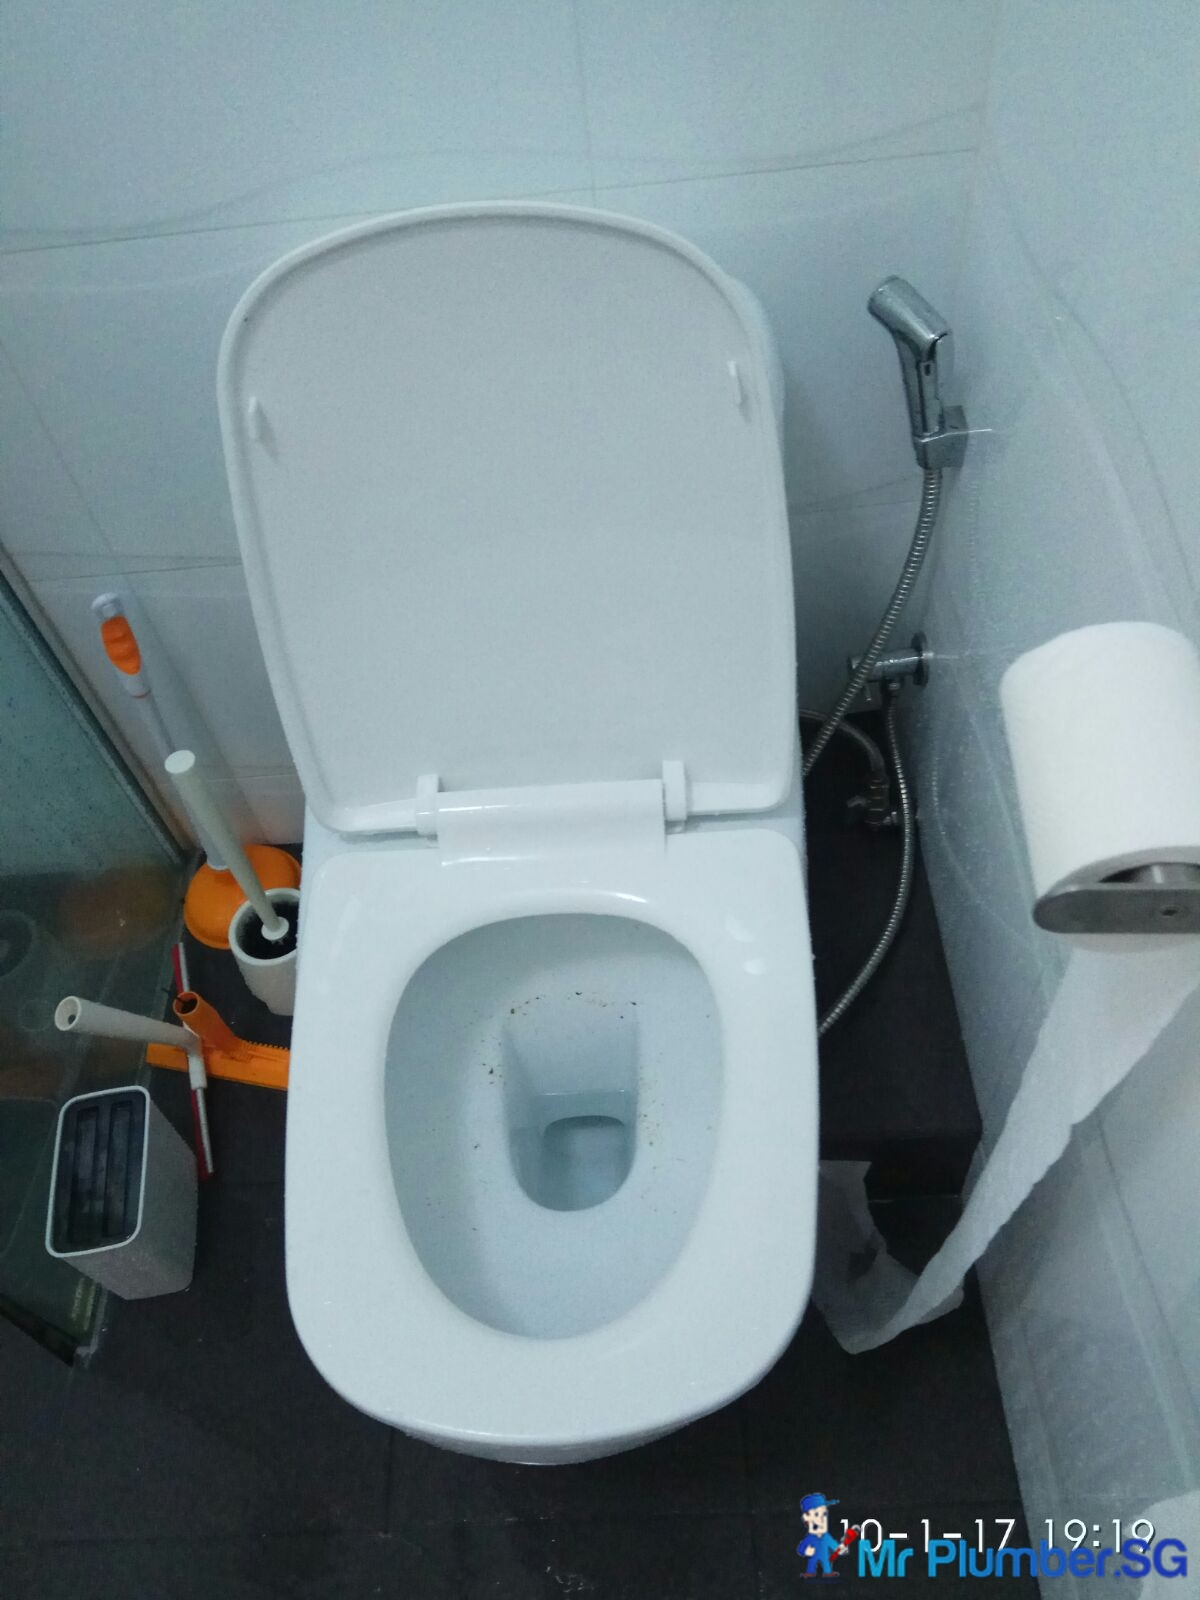 Clear Drainage Toilet Pipe Choke Plumber Singapore HDB Bukit